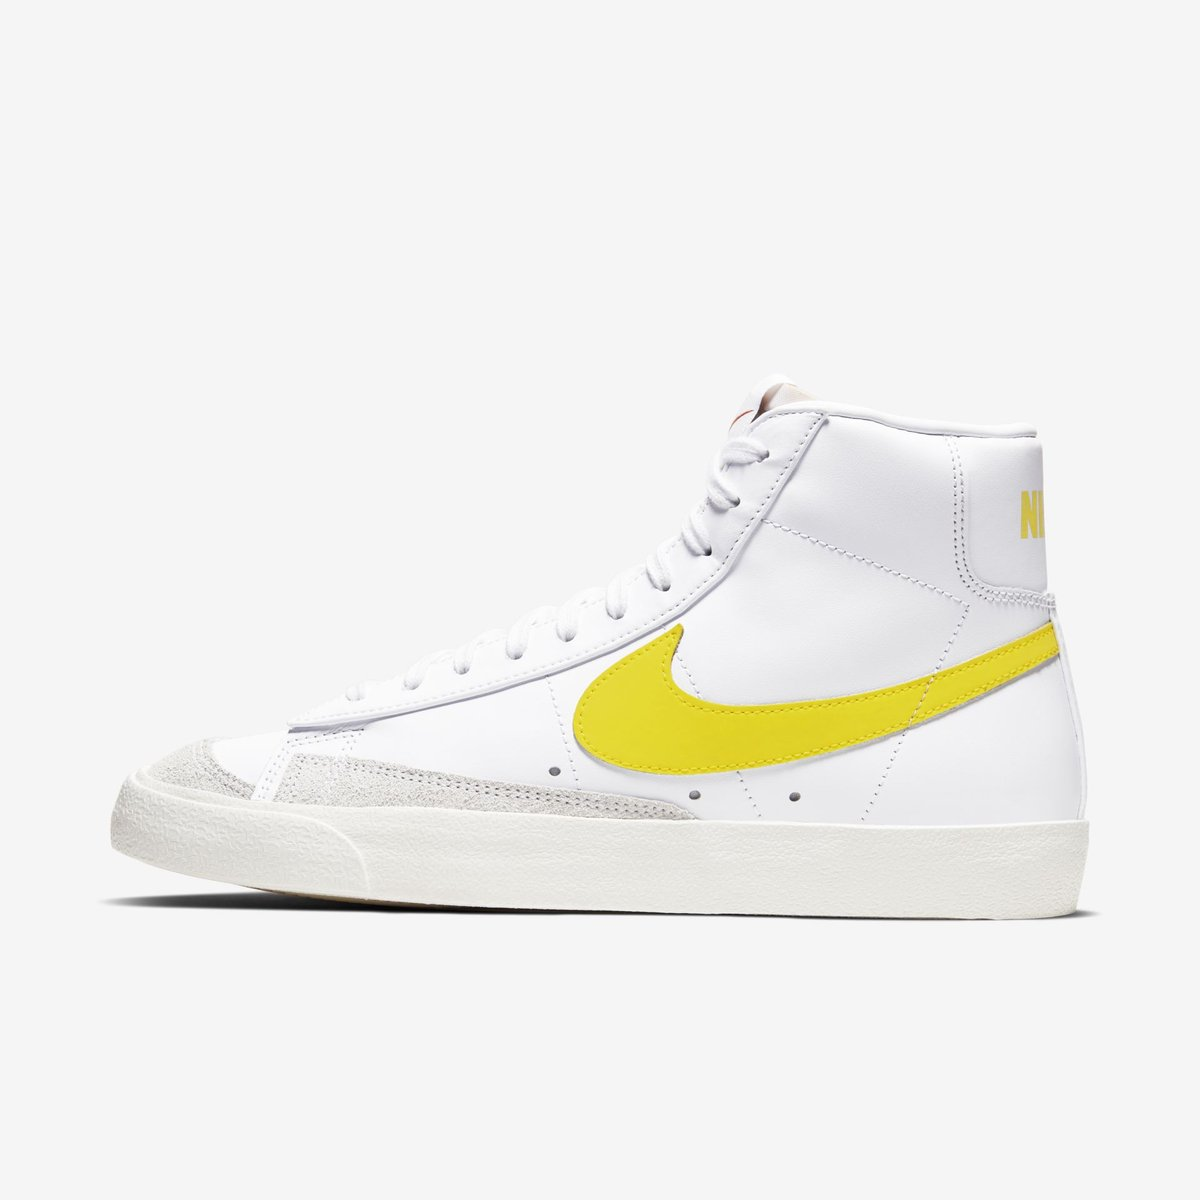 "ENDS TONIGHT: Nike Blazer Mid 77 Vintage ""White/Opti Yellow"" $59.98 on @nikestore with code LOGIN25 Link -> go.j23app.com/gqh"